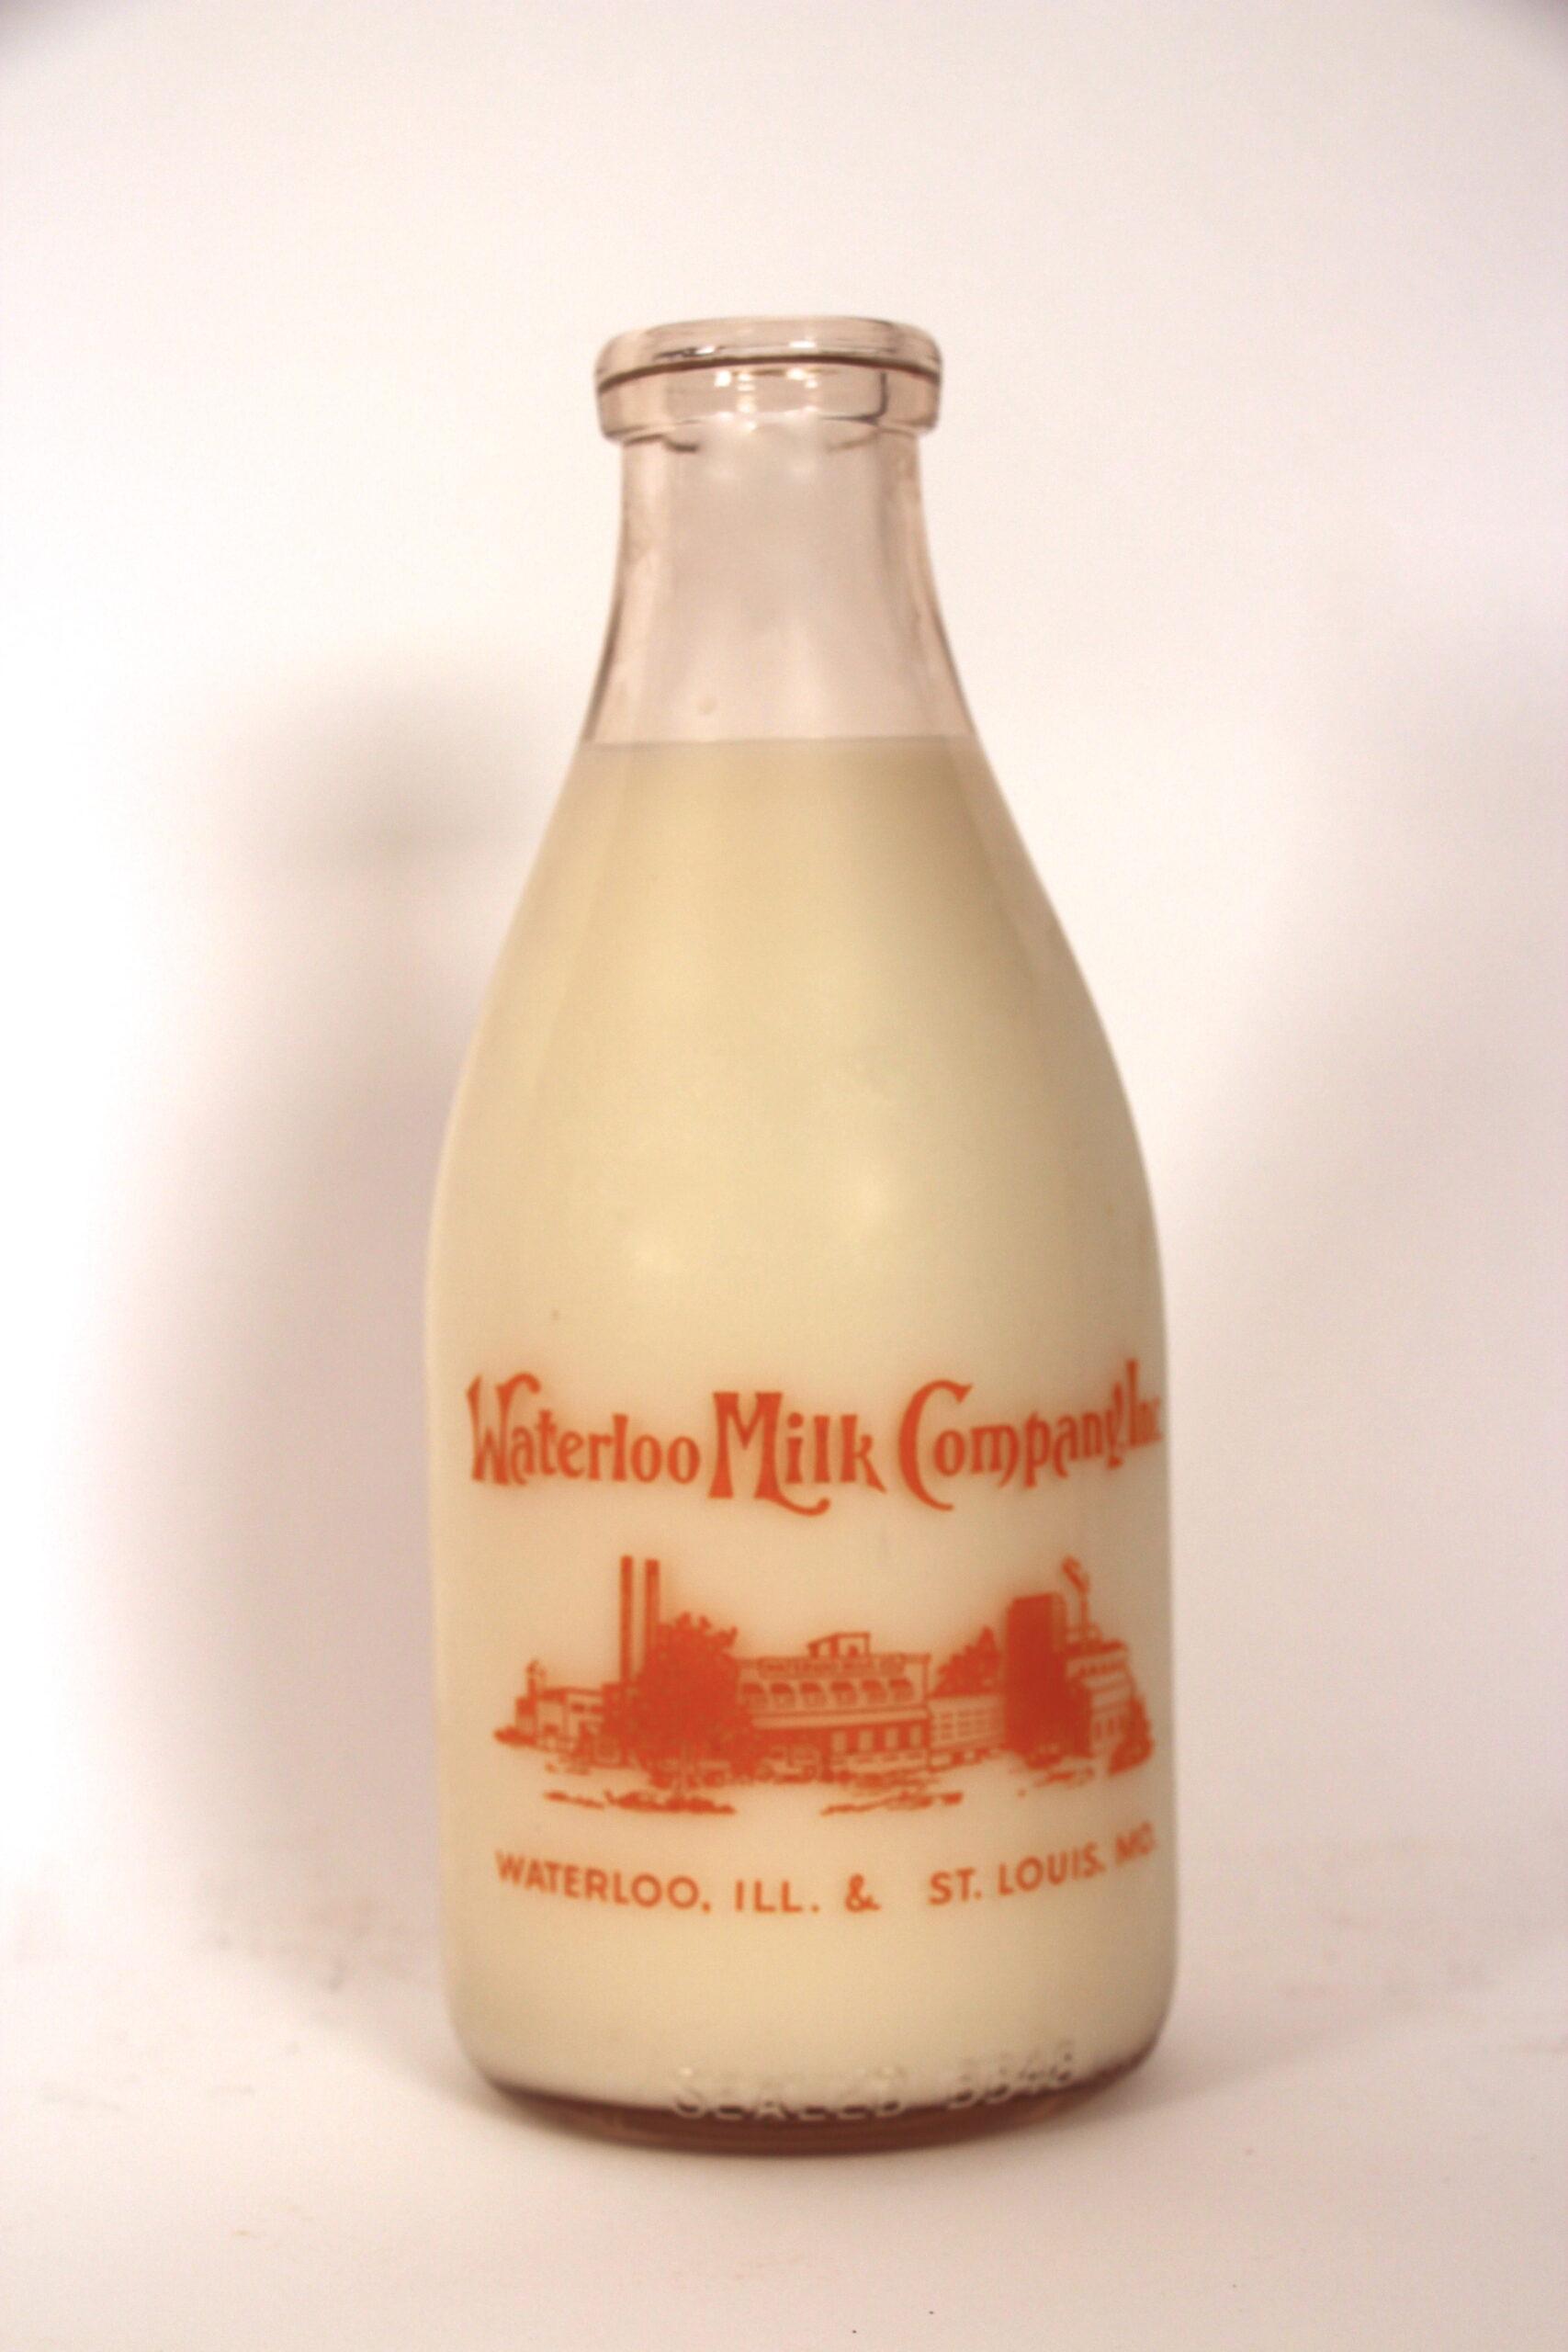 Waterloo Milk Co. Painted Label ACL Orange Paint, Waterloo, IL